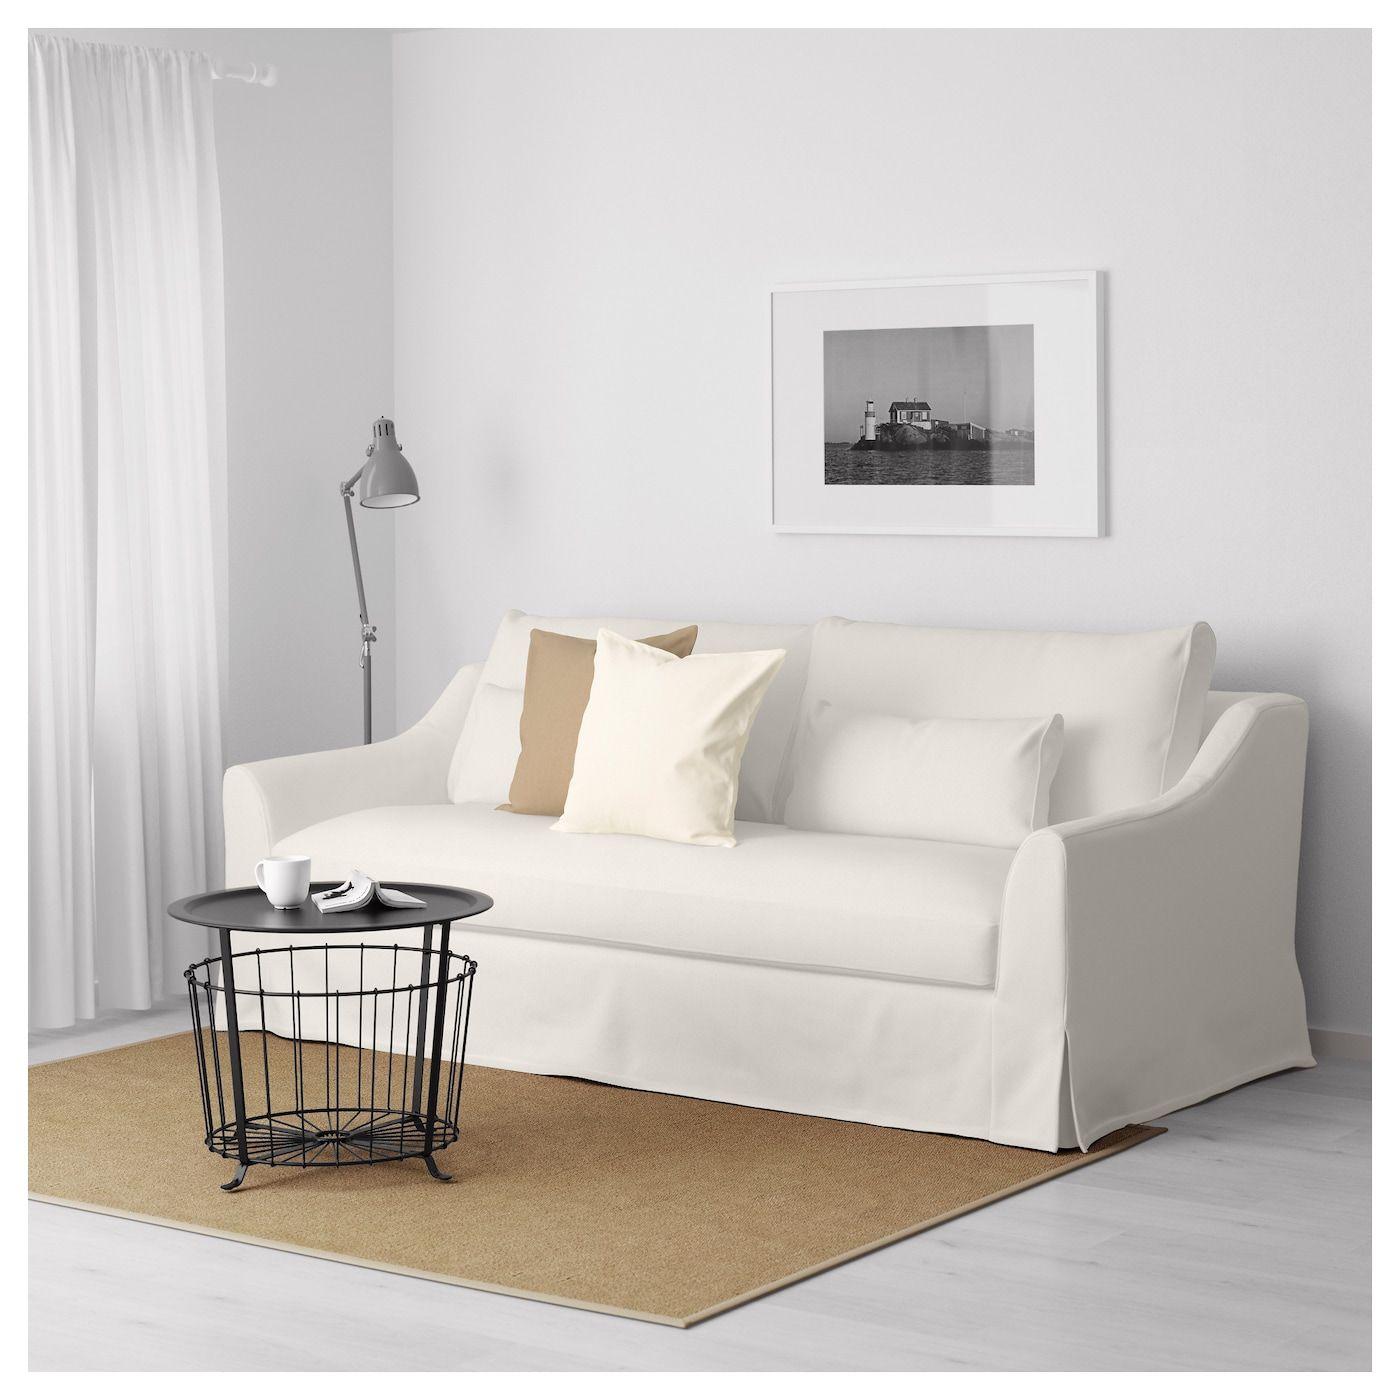 FÄRLÖV Sofa, Flodafors white IKEA Love seat, Ikea sofa